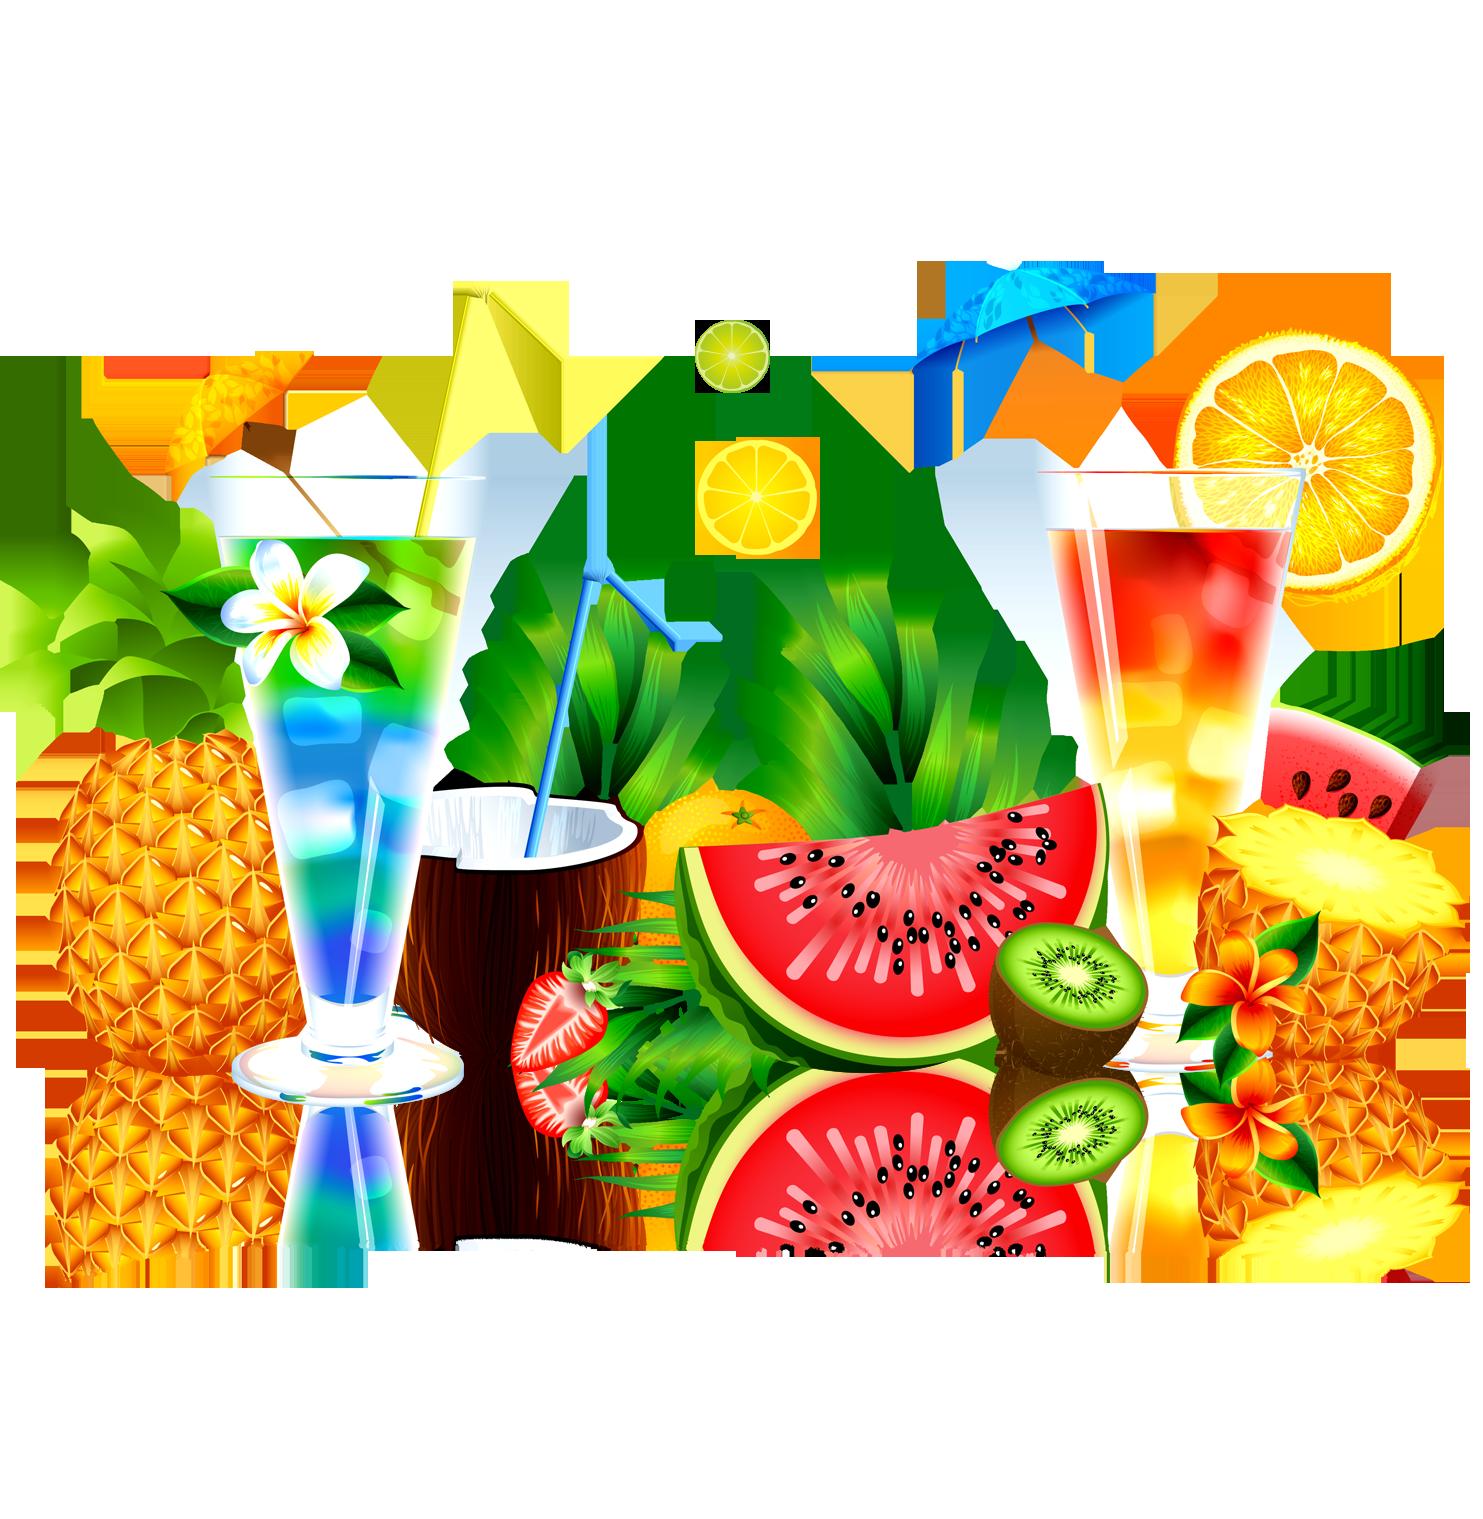 Cocktails clipart pineapple drink. Juice fruit watermelon summer